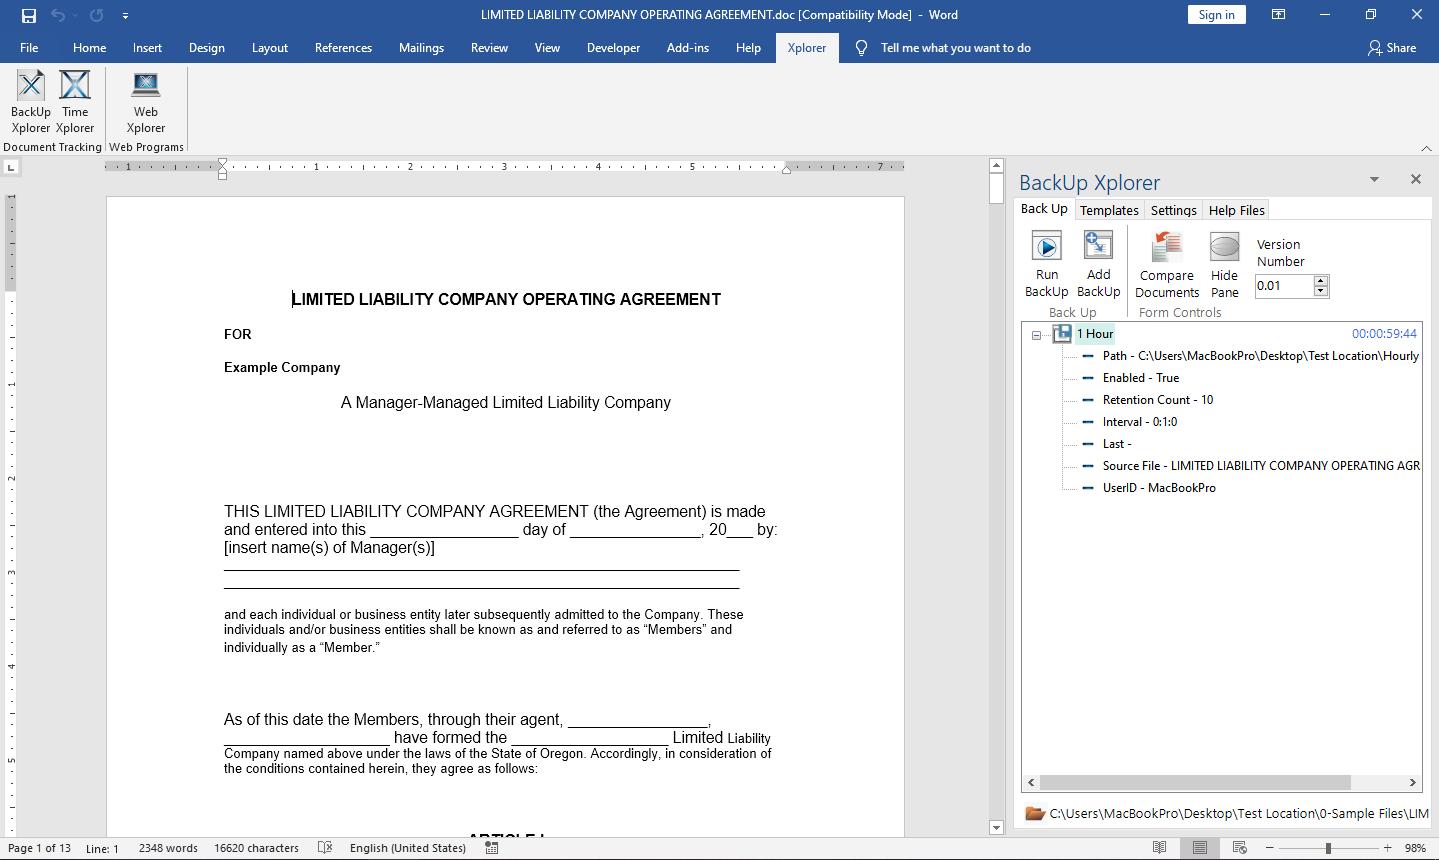 Task pane with Backup Xplorer shown in Microsoft Word.